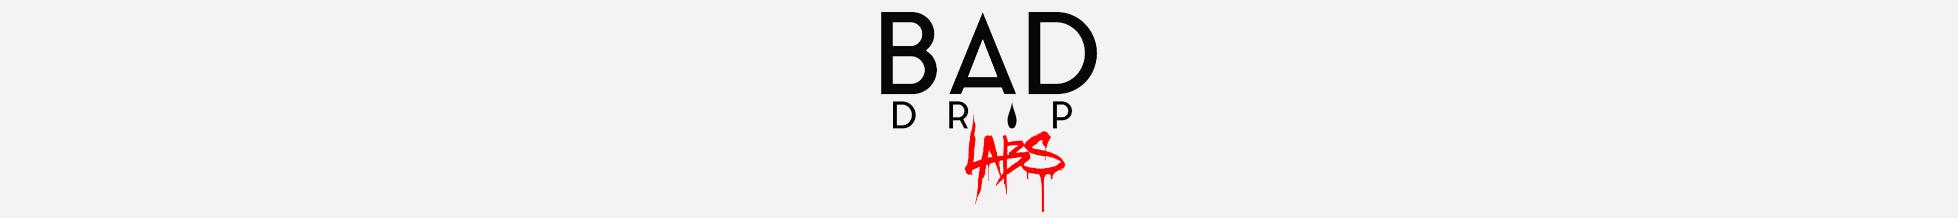 bad-drip-labs.jpg